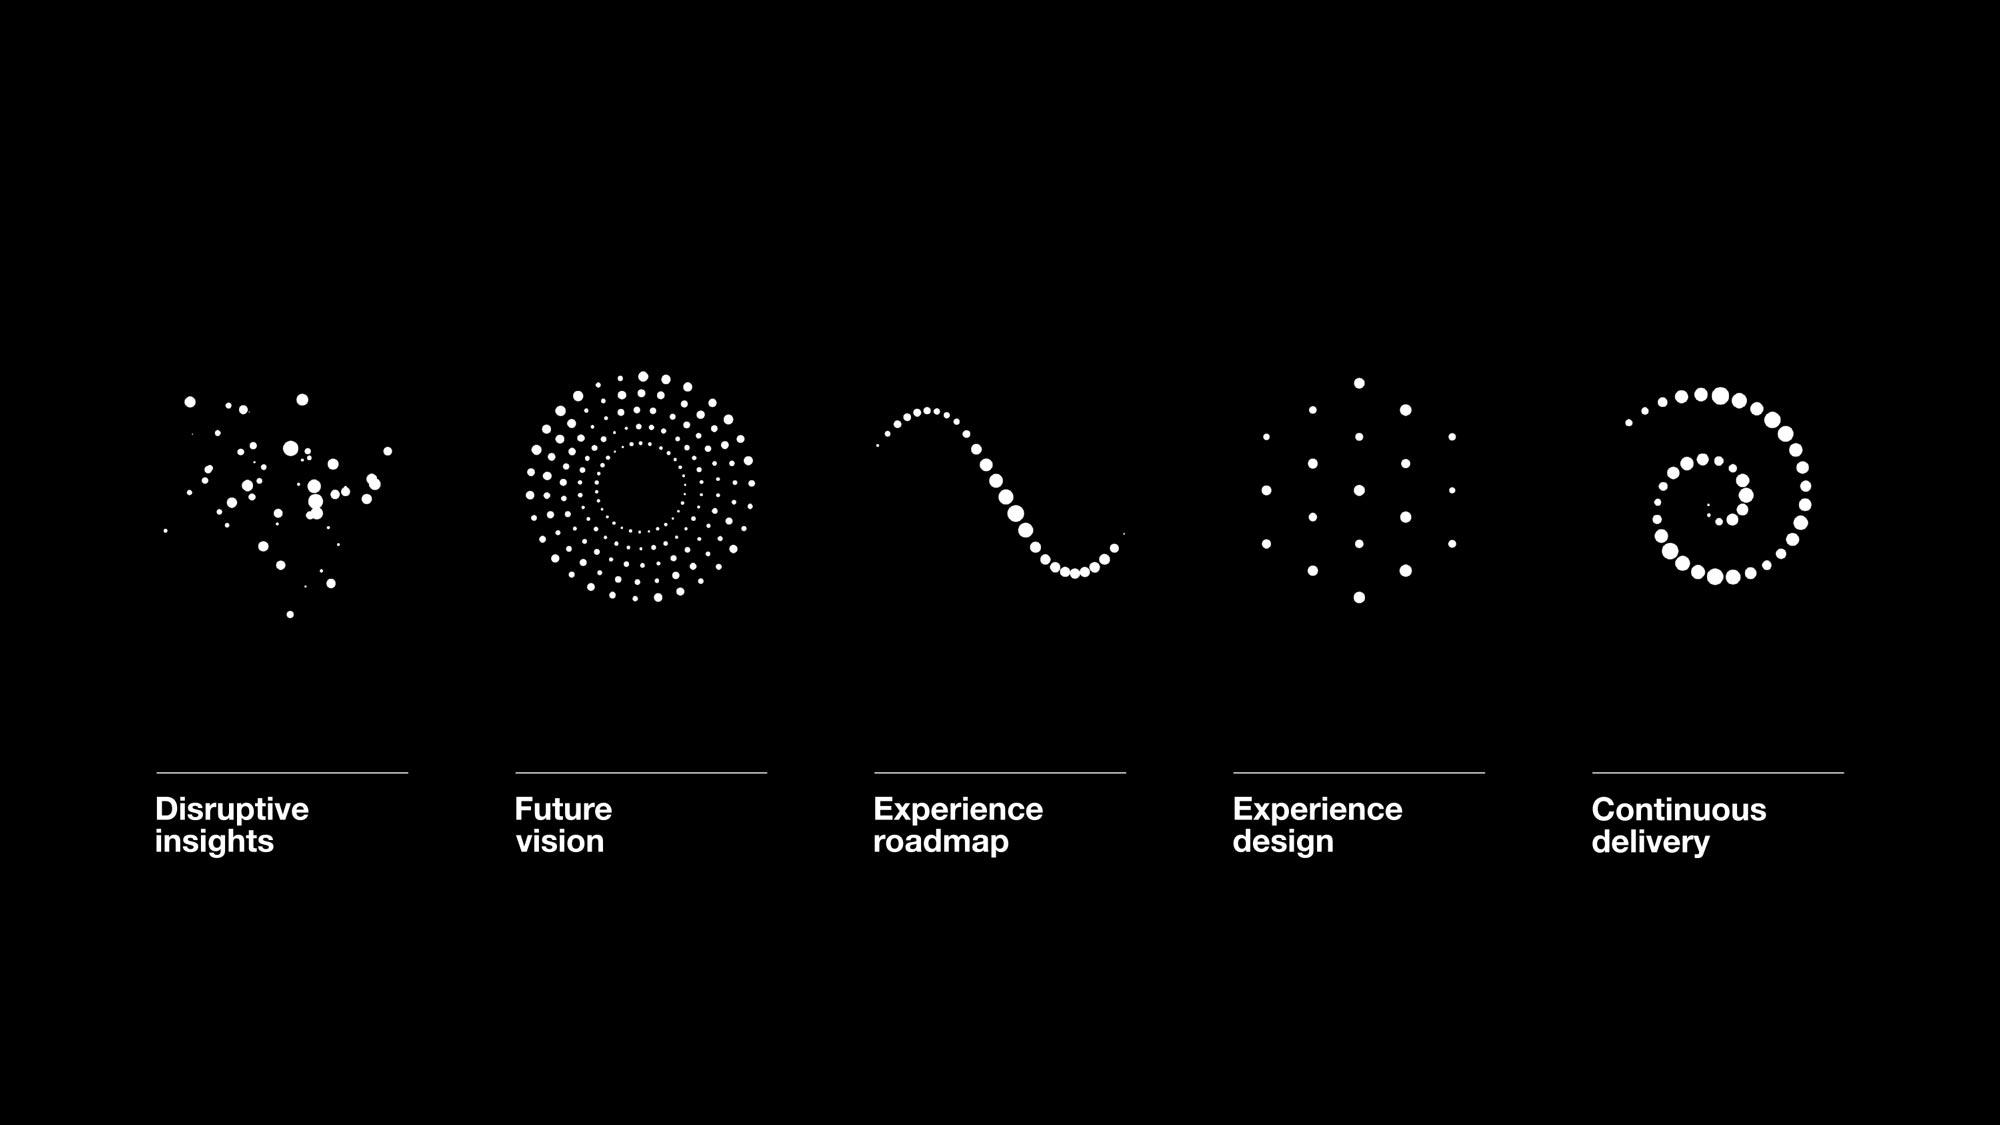 designitprocess-01-sinisalminen-08c